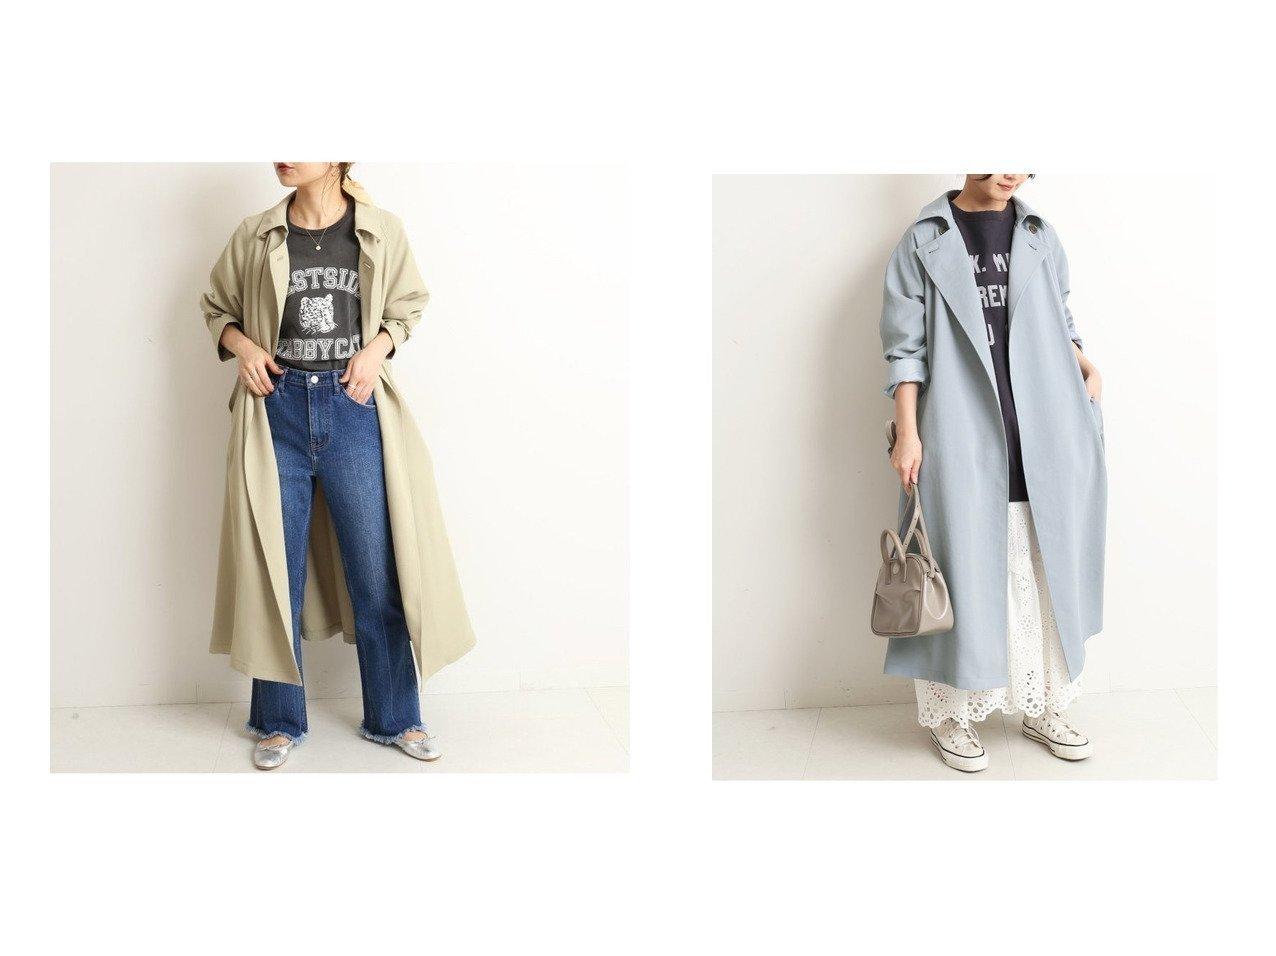 【SLOBE IENA/スローブ イエナ】のウォッシャブルニュアンスコート 【アウター】おすすめ!人気、トレンド・レディースファッションの通販  おすすめで人気の流行・トレンド、ファッションの通販商品 メンズファッション・キッズファッション・インテリア・家具・レディースファッション・服の通販 founy(ファニー) https://founy.com/ ファッション Fashion レディースファッション WOMEN アウター Coat Outerwear コート Coats 2021年 2021 2021春夏・S/S SS/Spring/Summer/2021 S/S・春夏 SS・Spring/Summer シンプル スリーブ リラックス ロング 春 Spring |ID:crp329100000027431